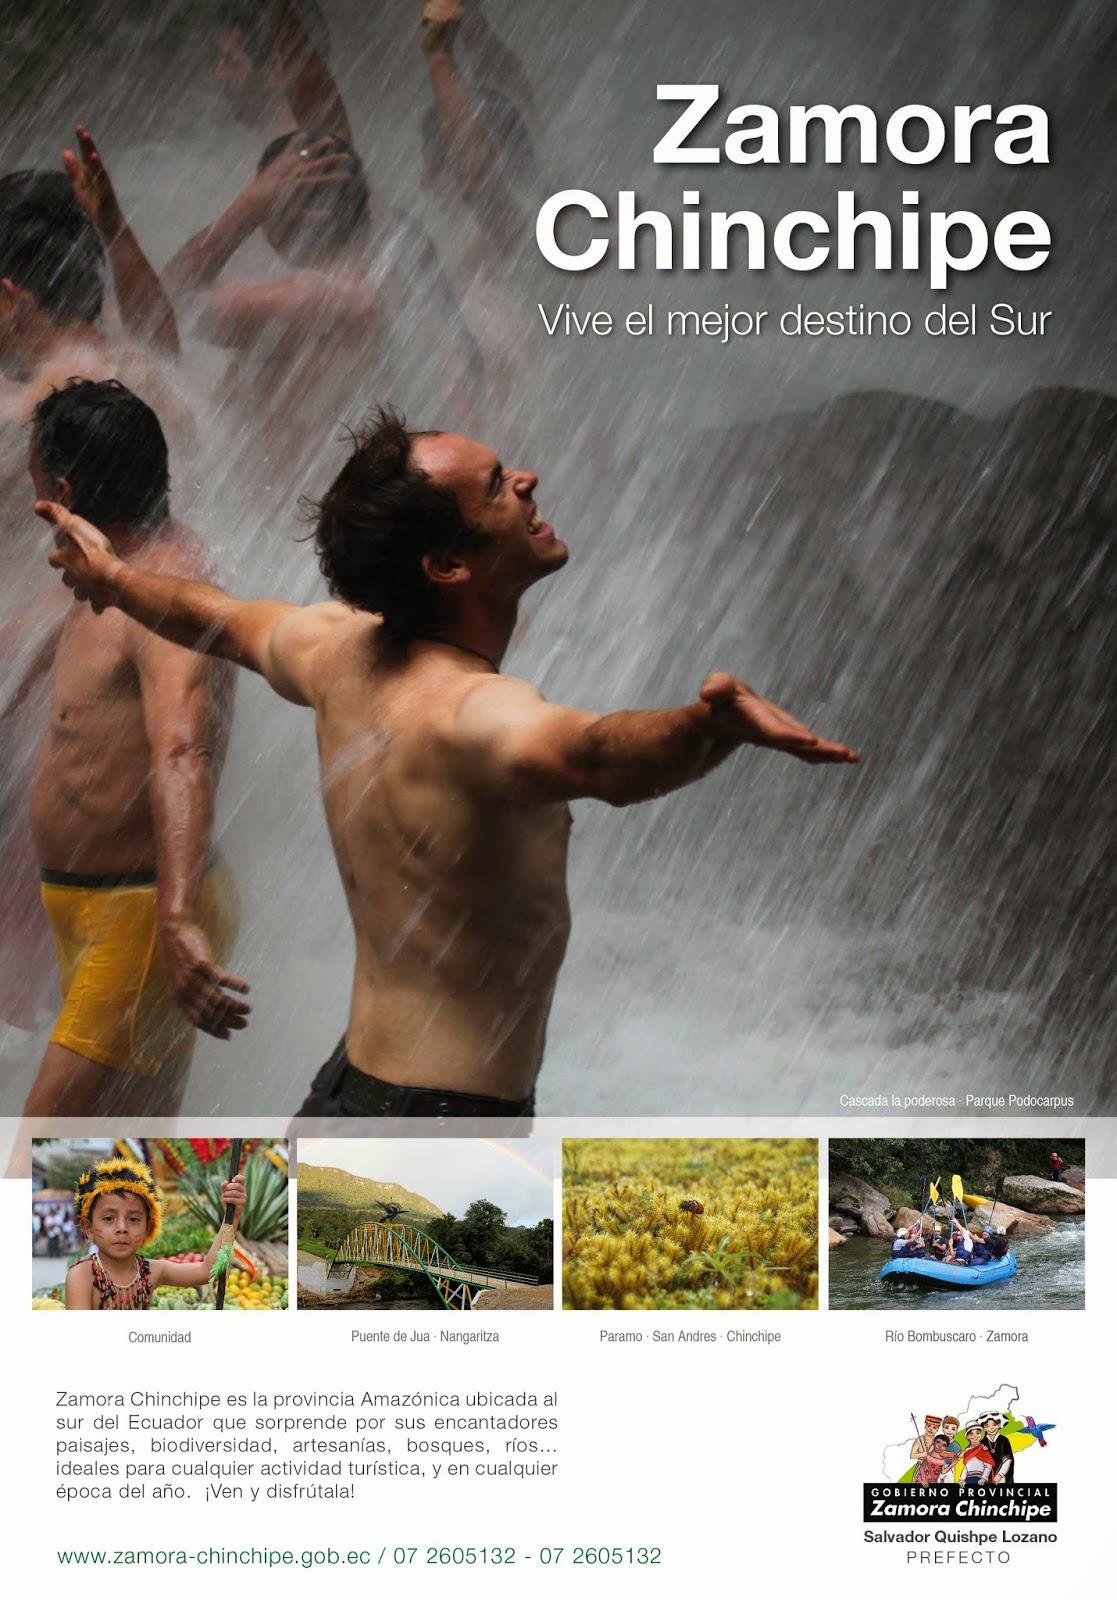 gente zamora chinchipe: